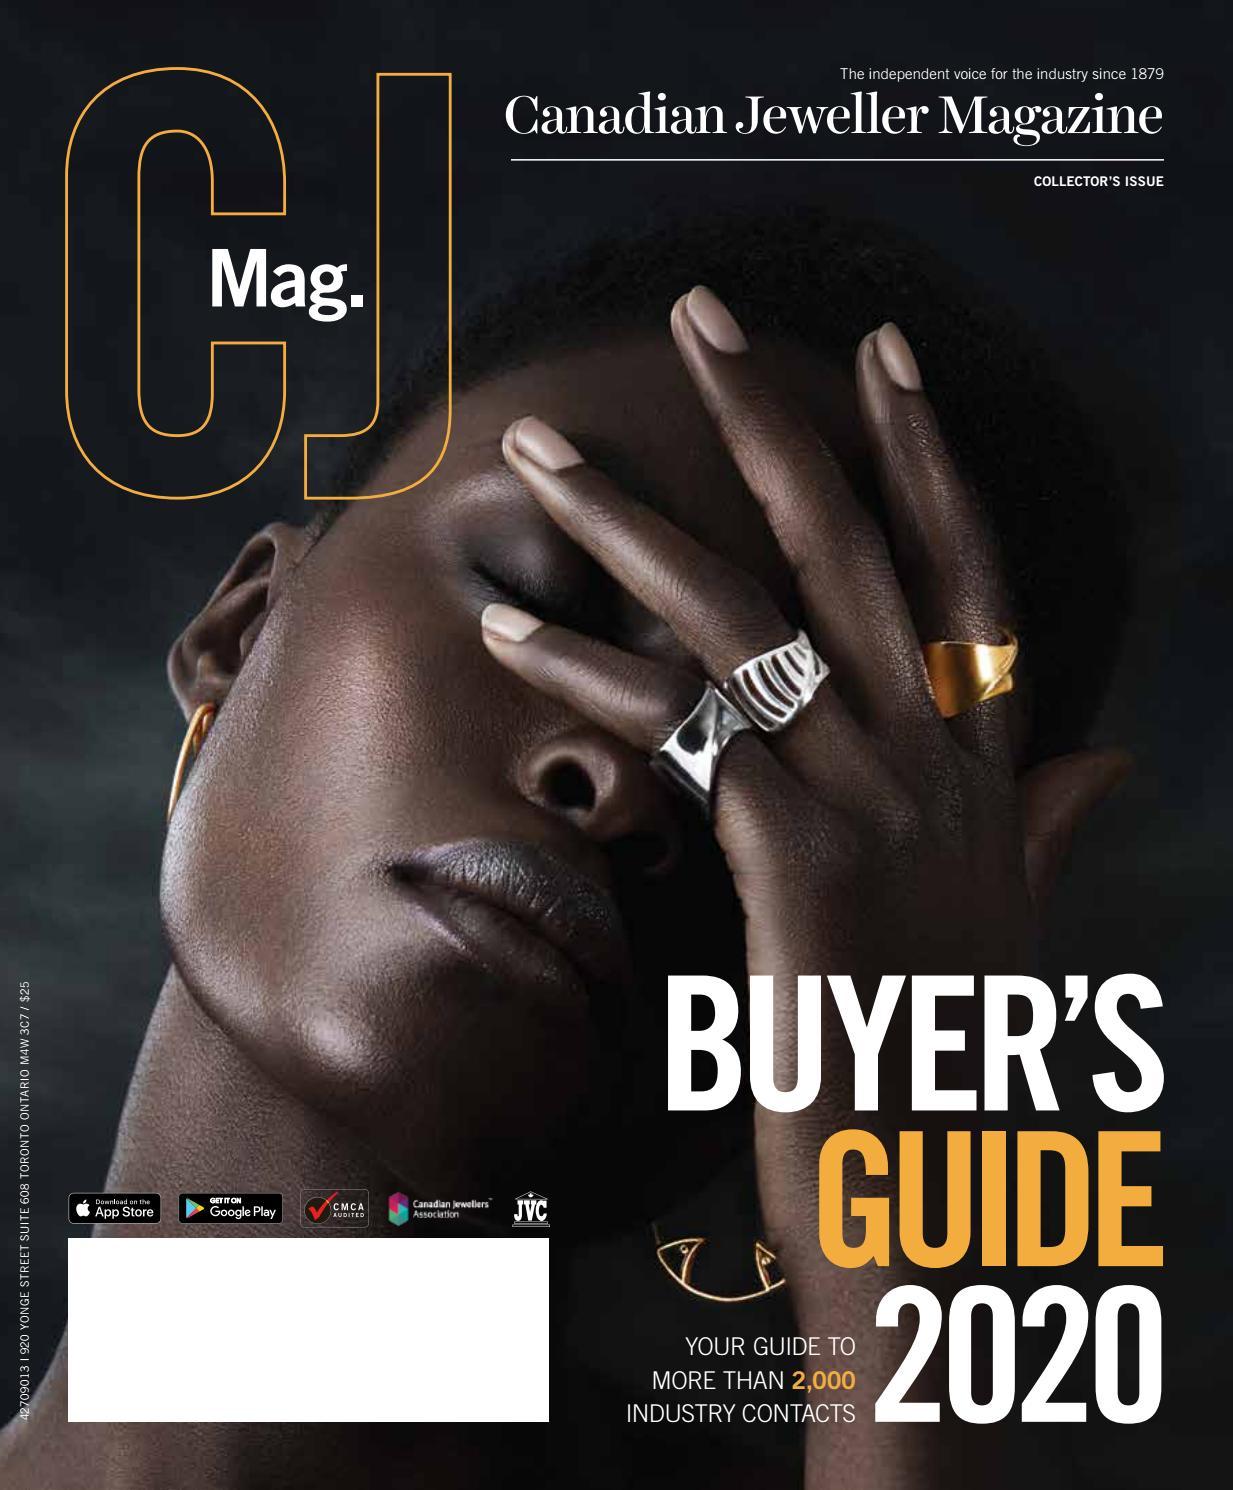 C Maison Et Jardin Magazine cj buyers guide 2020canadian jeweller magazine - issuu